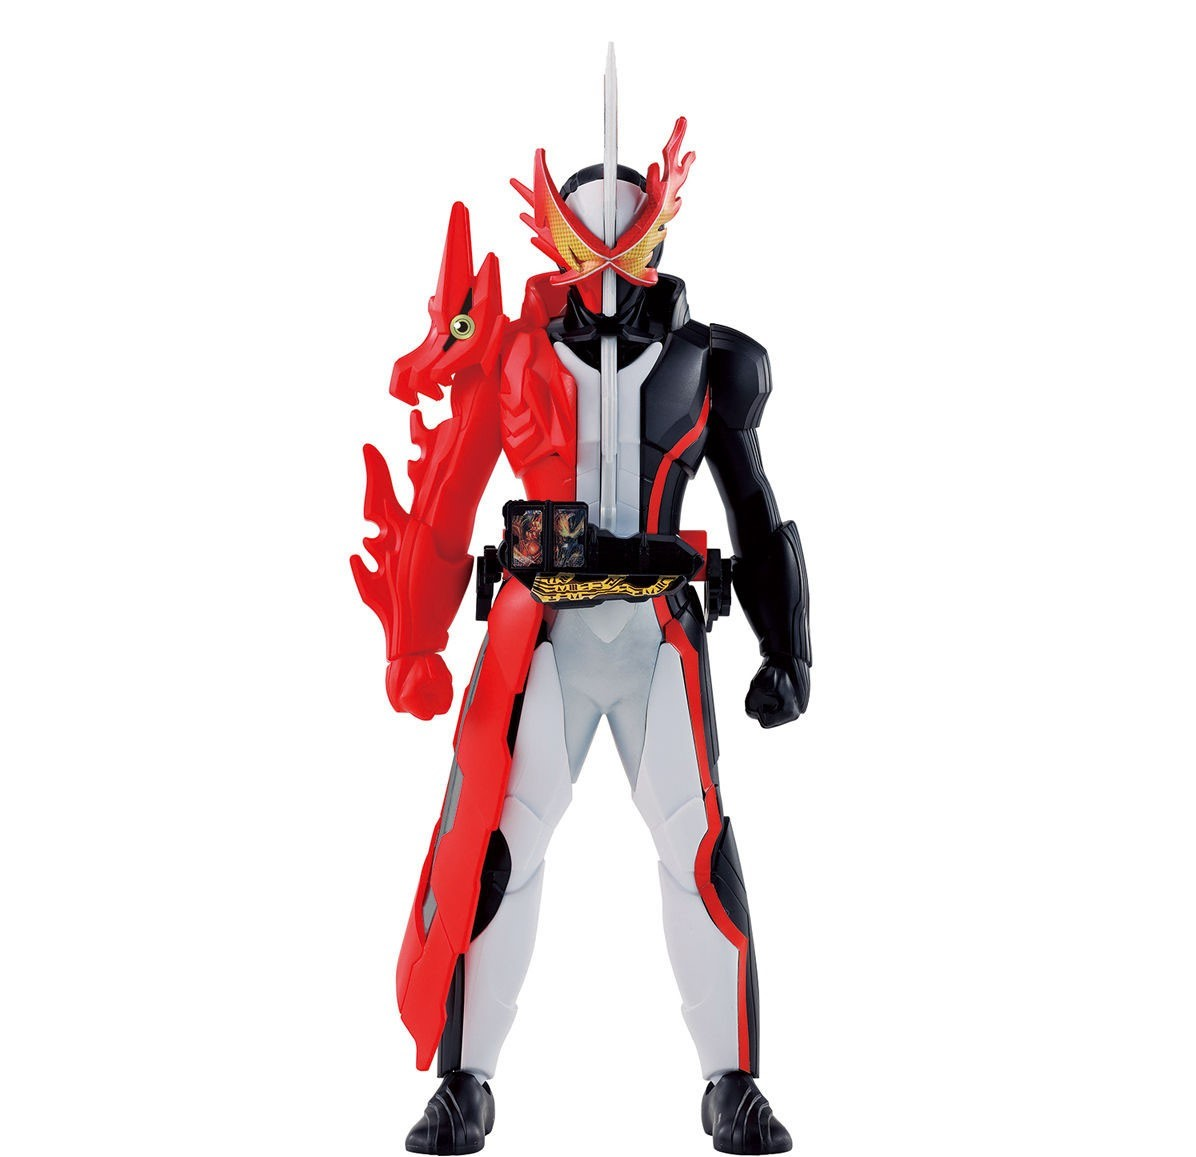 Bandai Spirits Entry Grade Kamen Rider Saber